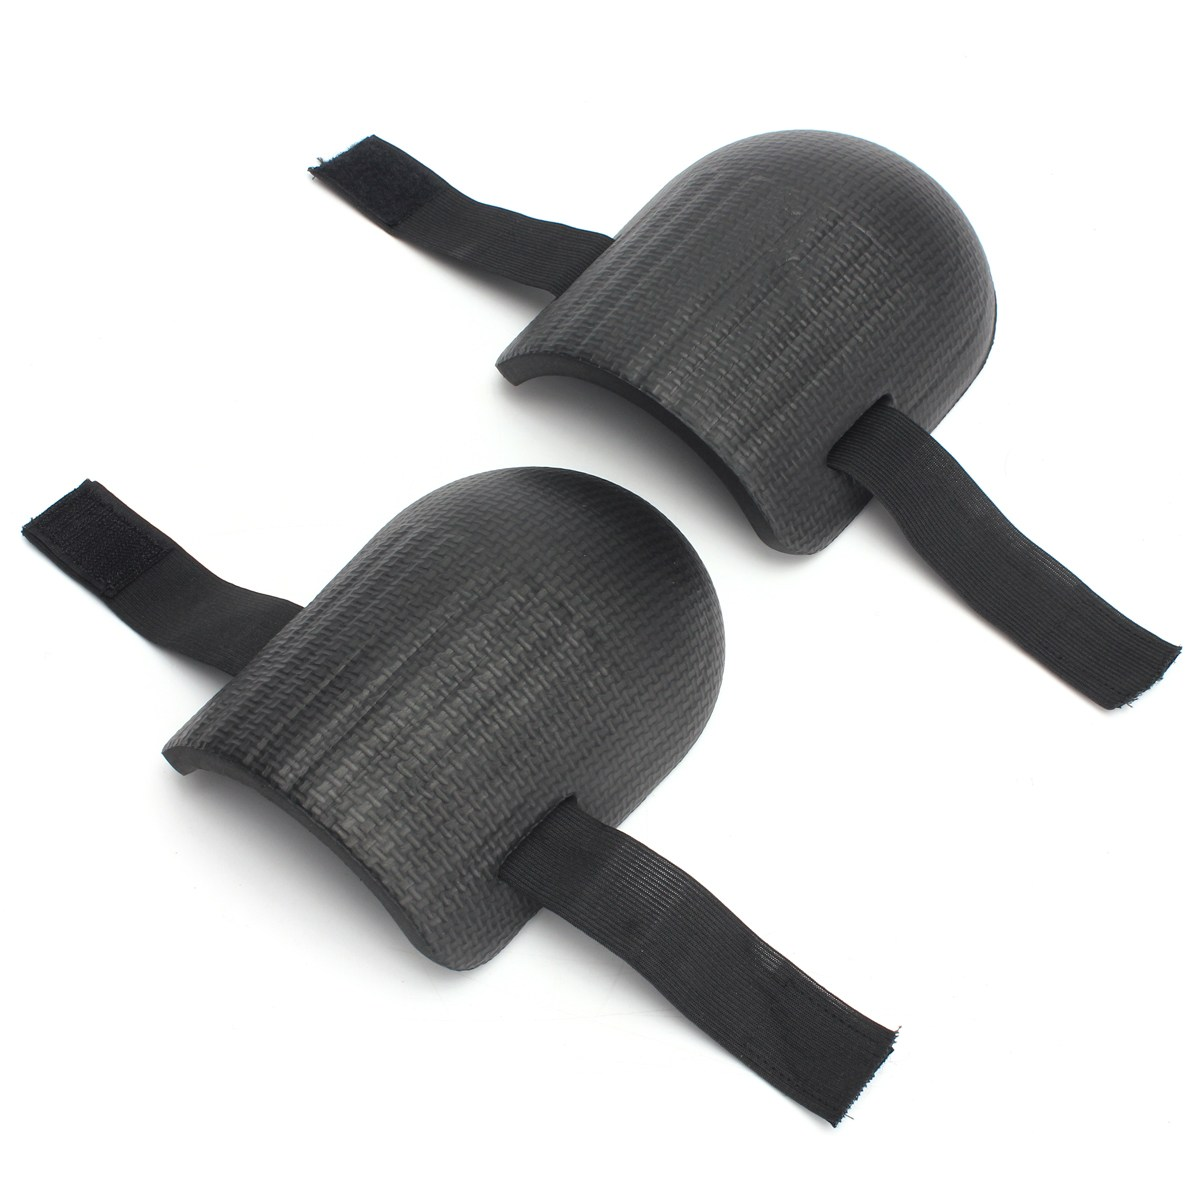 New 1 Pair Soft Foam Knee Pads Protectors Cushion Sport Work Gardening Builder